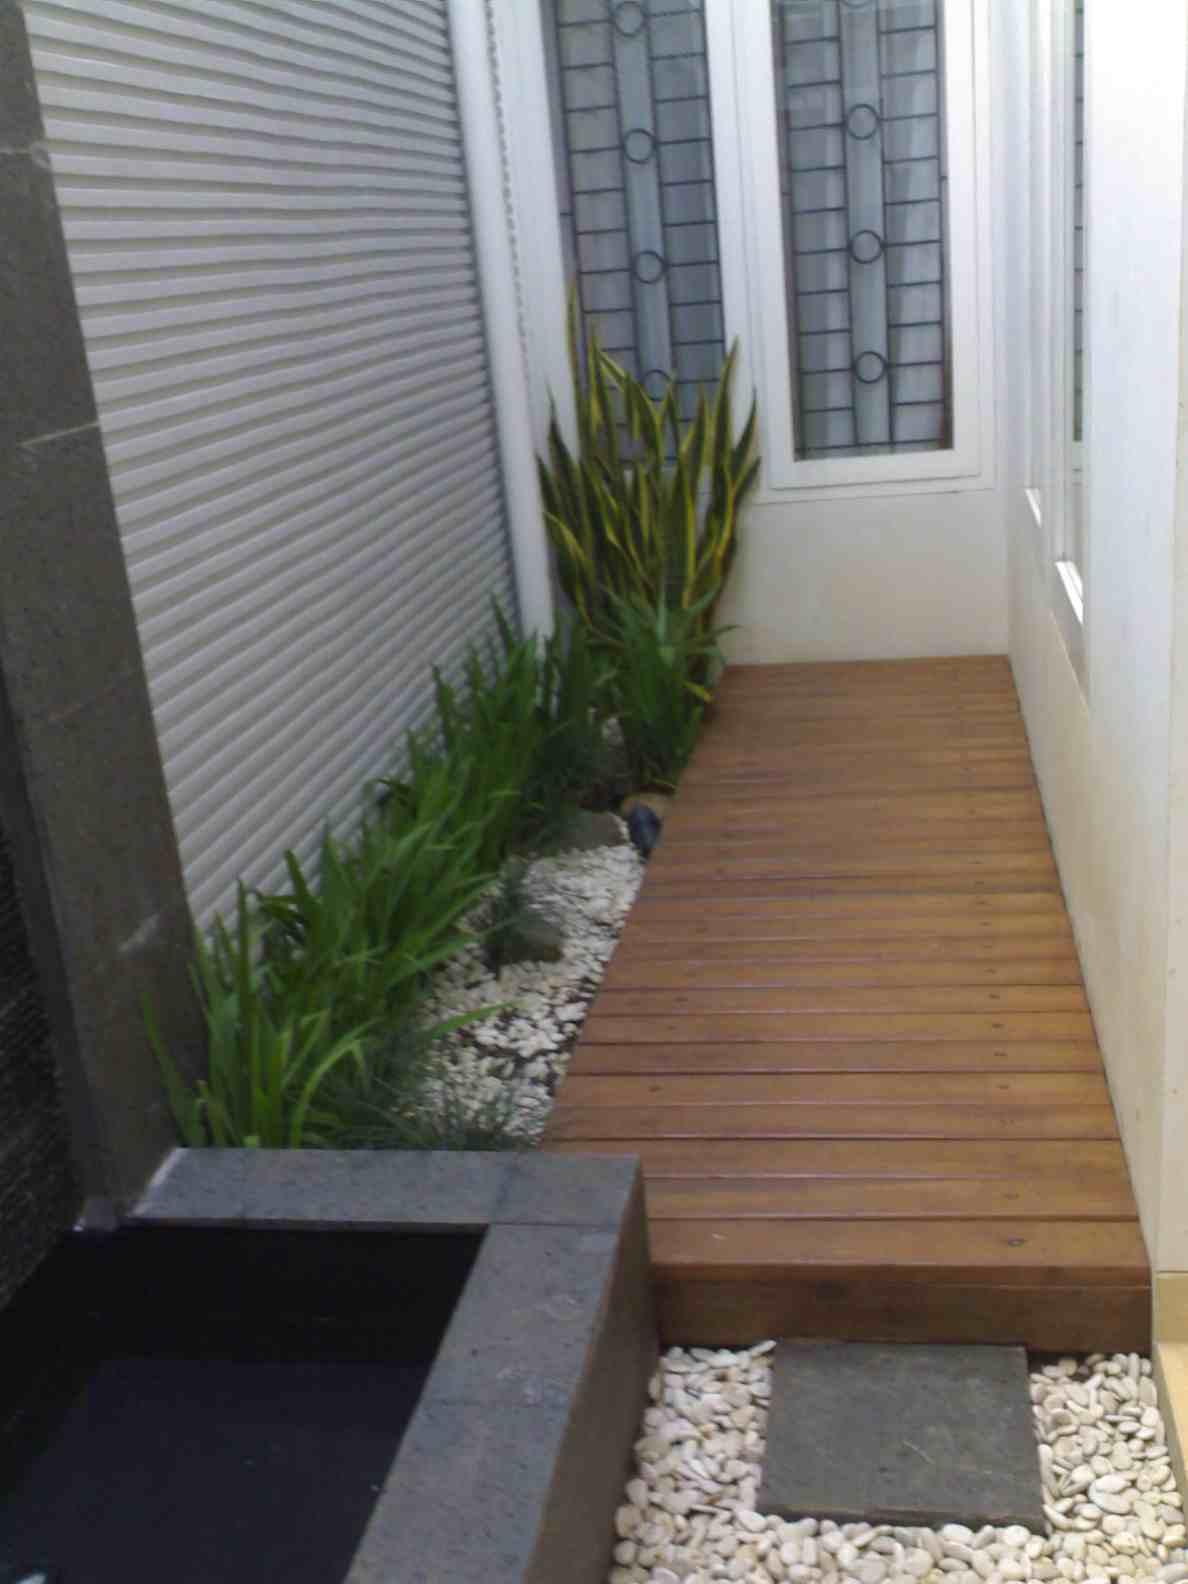 Taman Belakang Rumah Minimalis Lahan Sempit Destaman